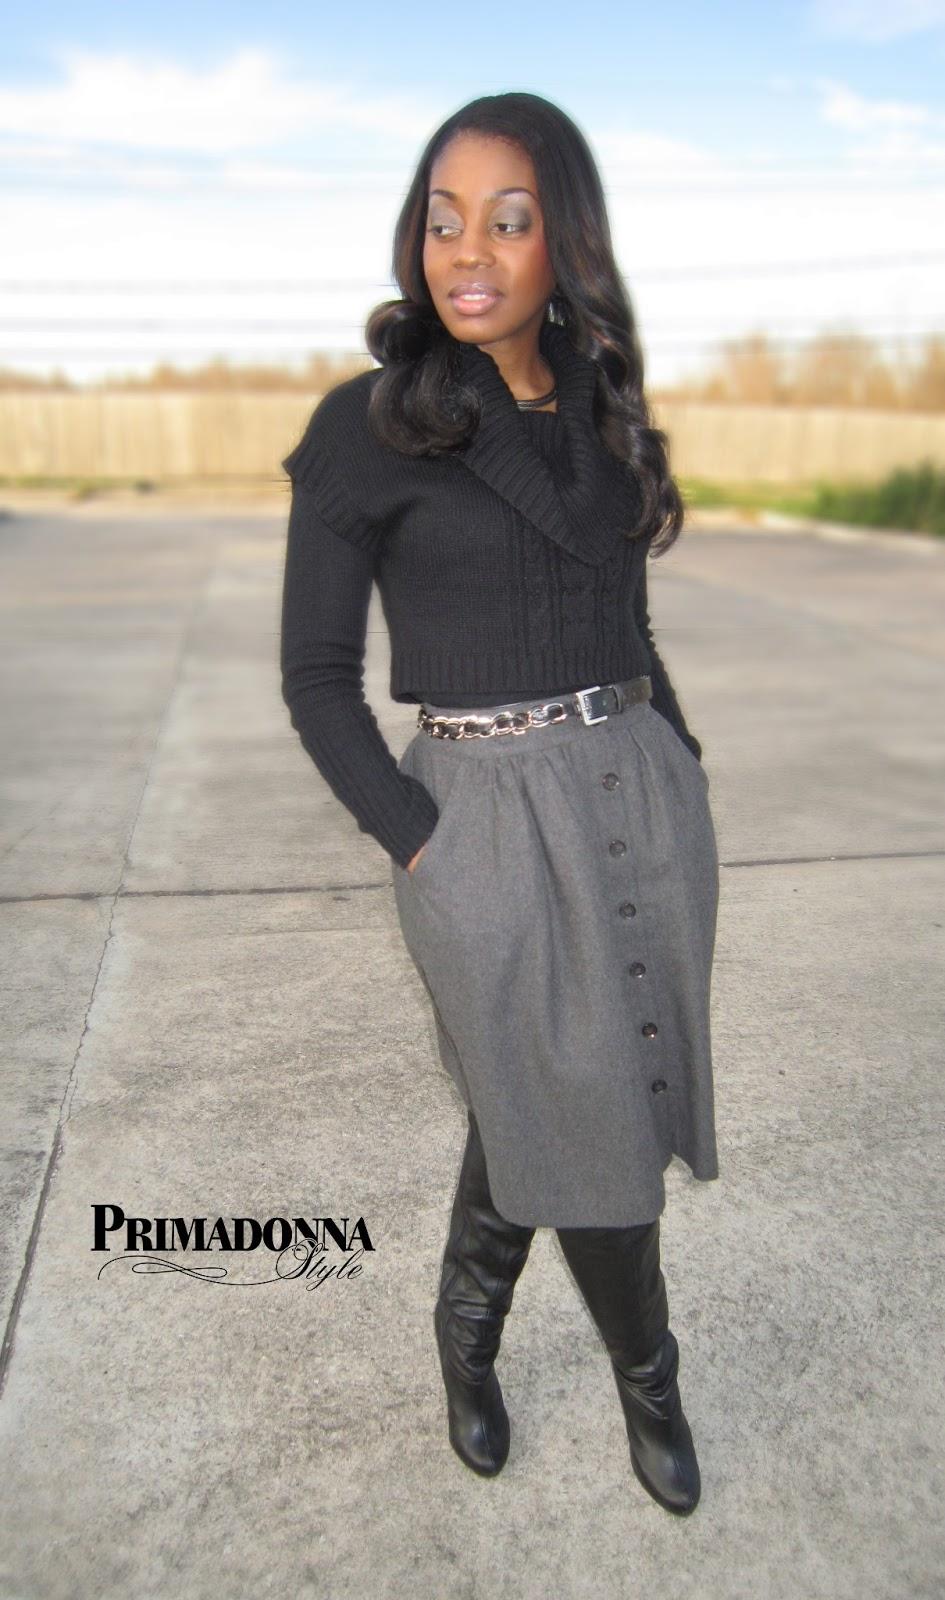 primadonna style january 2013